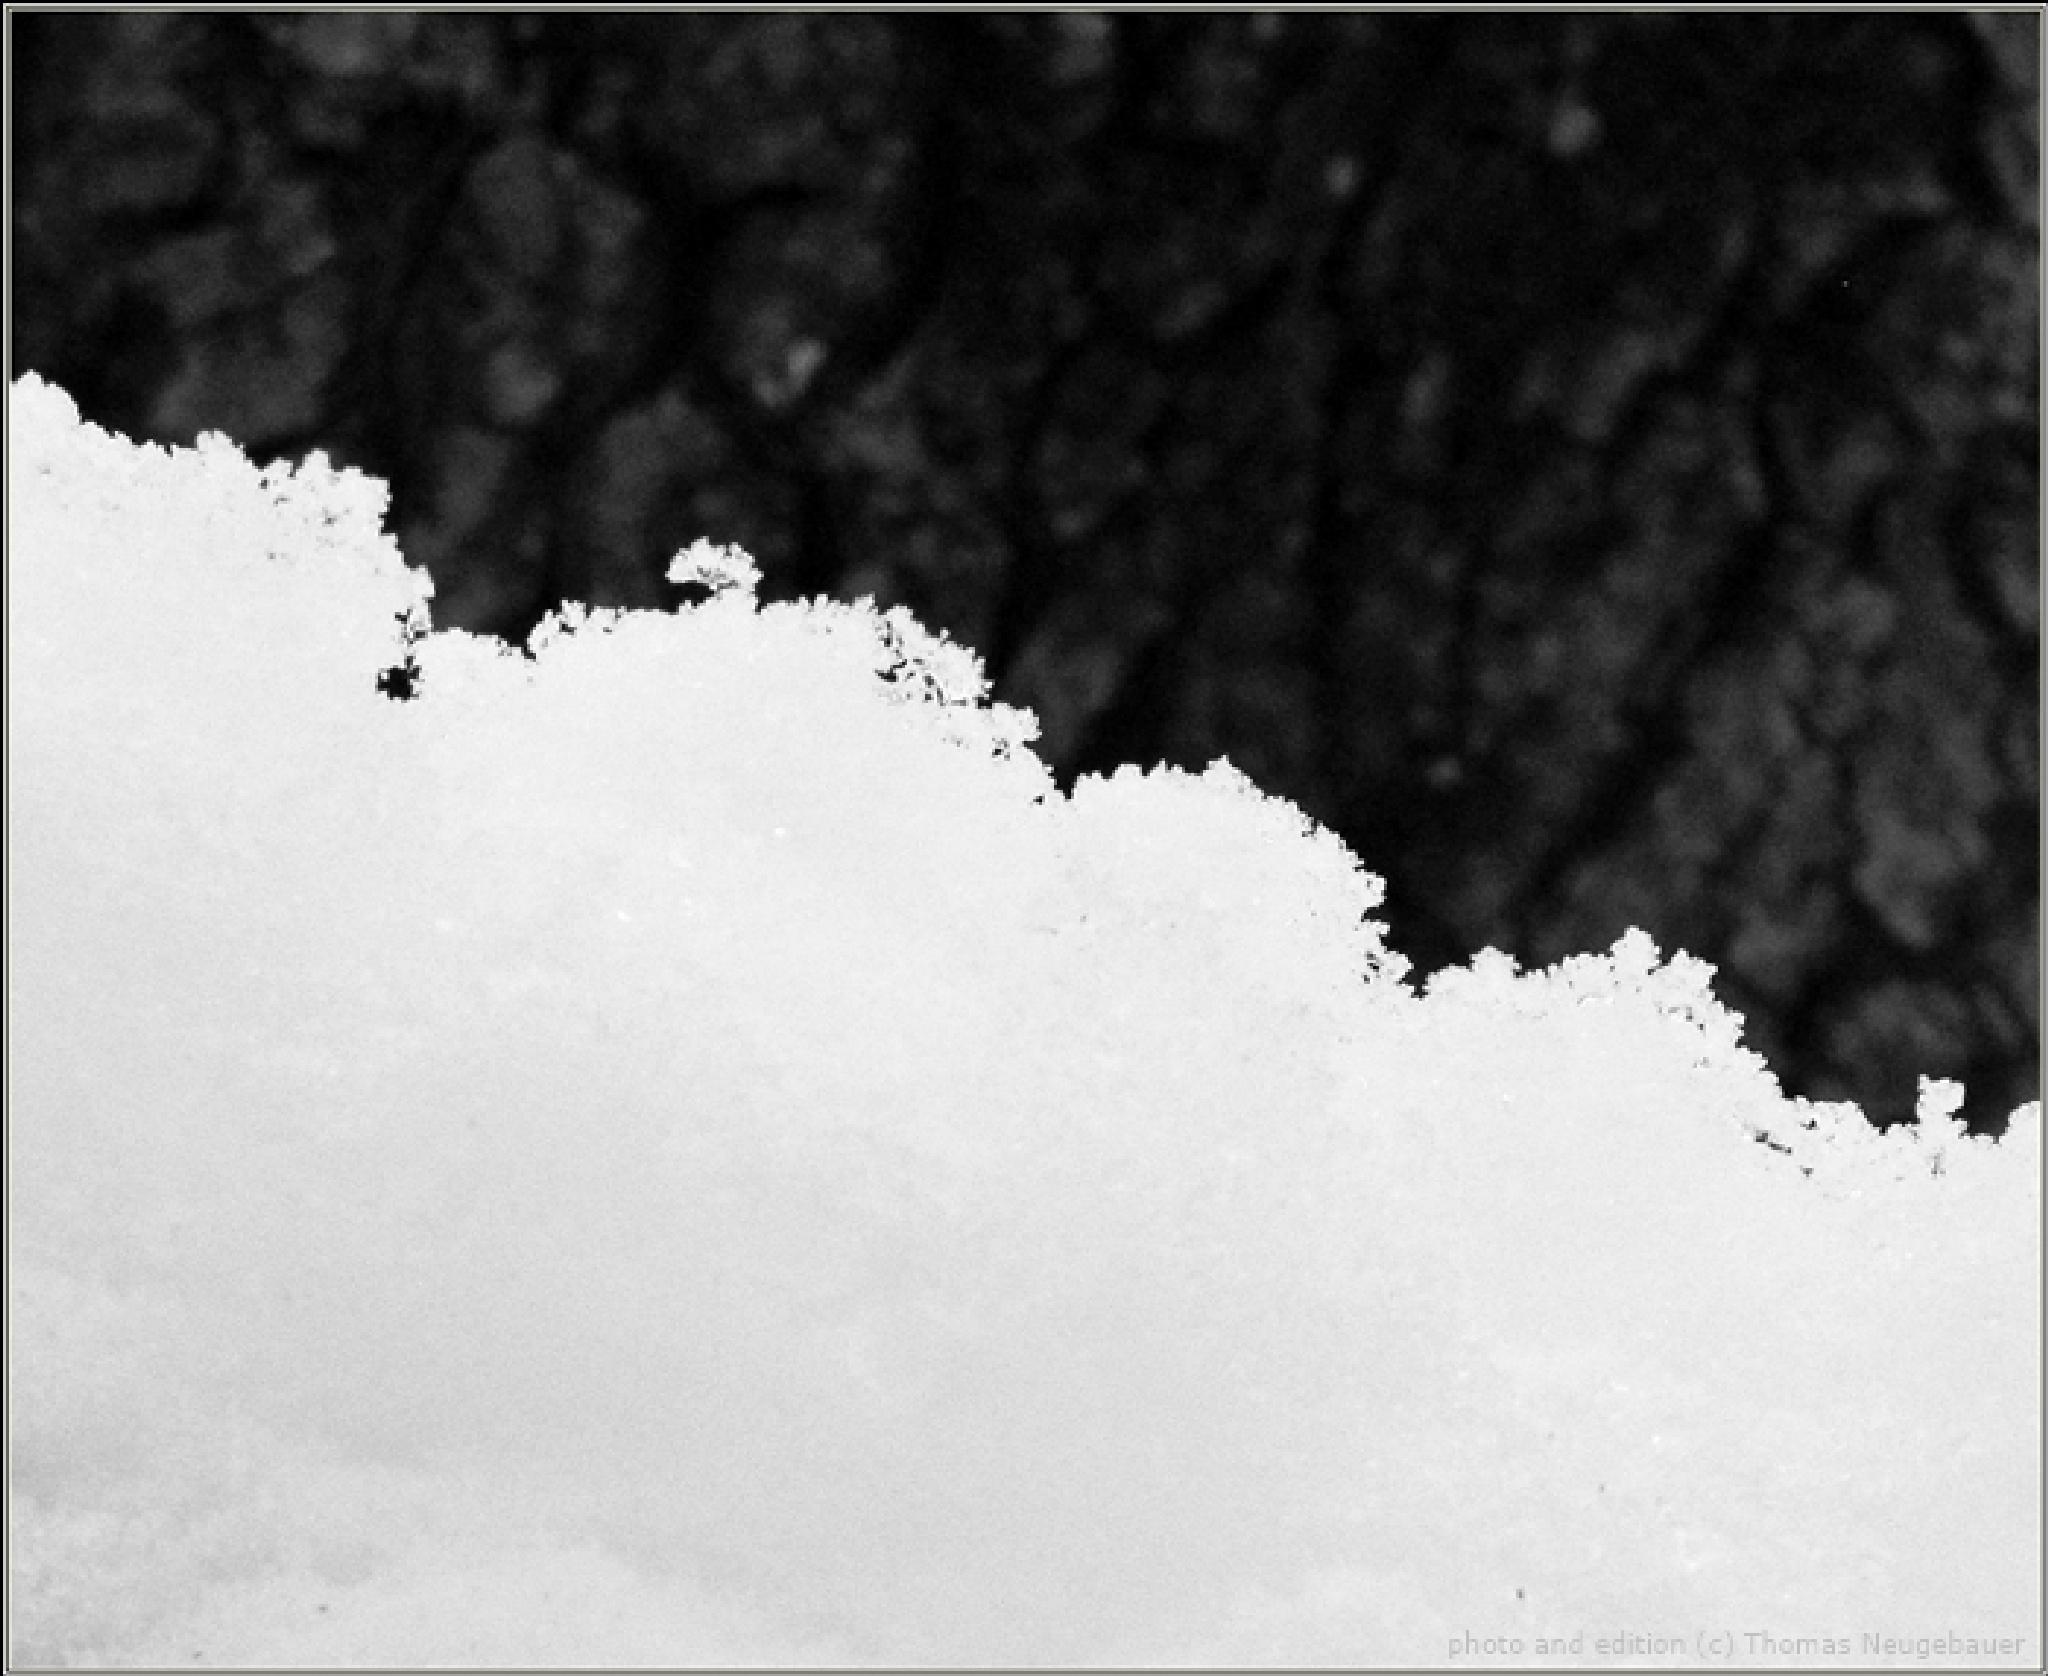 # 531 SNOW by Thomas Neugebauer